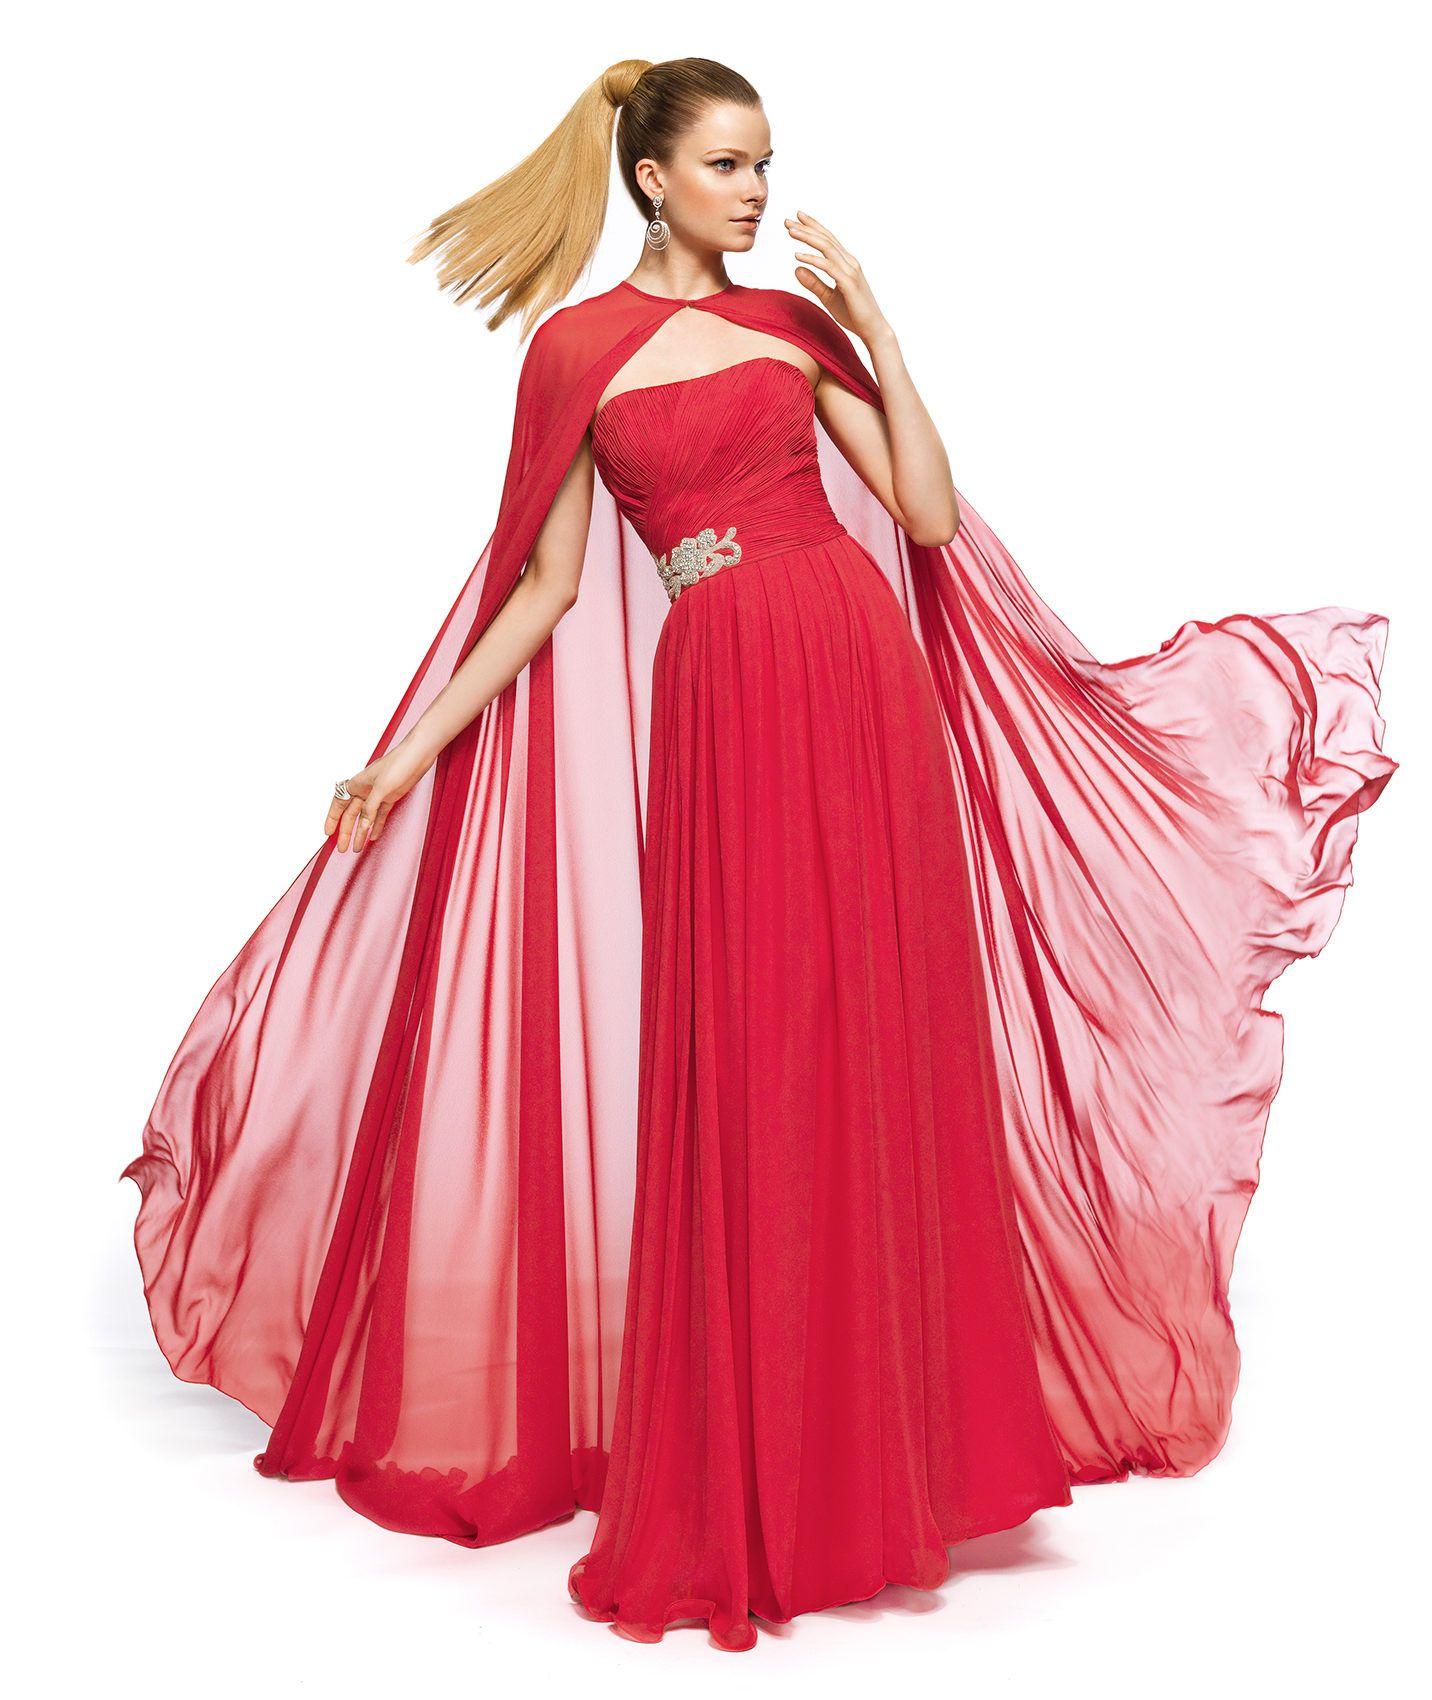 Zalba cocktail dress 2013